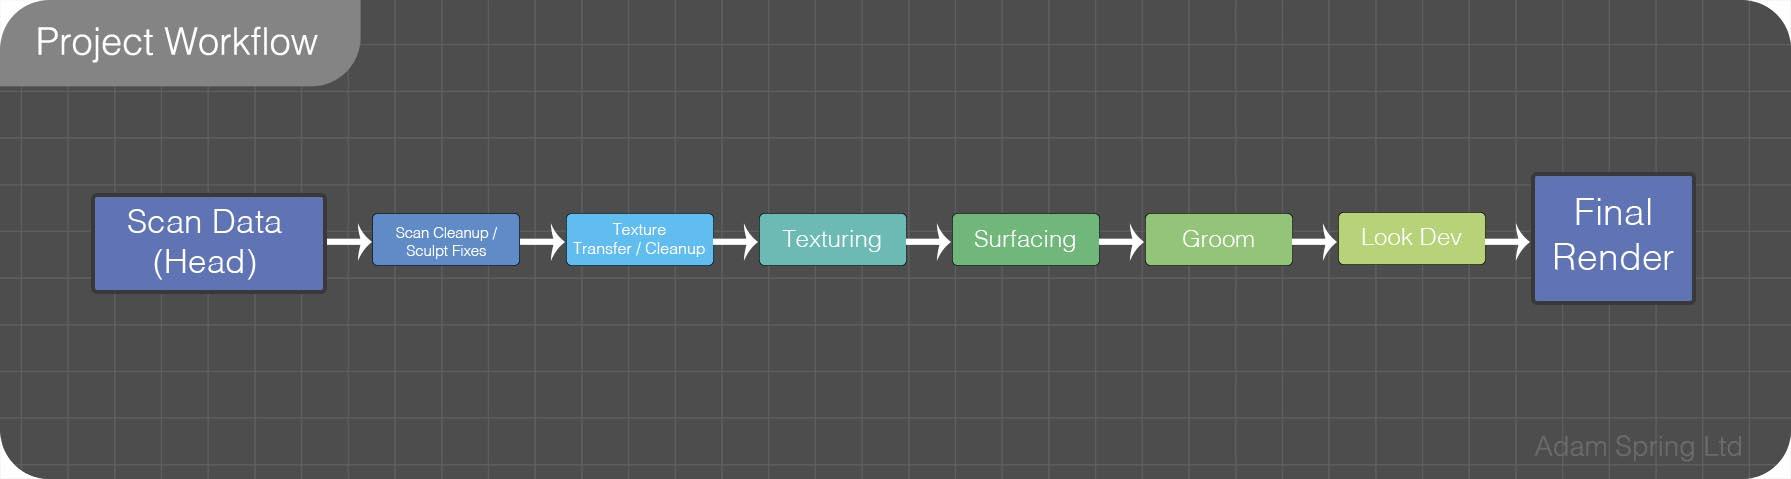 Project Workflow | Adam Spring | Official Website